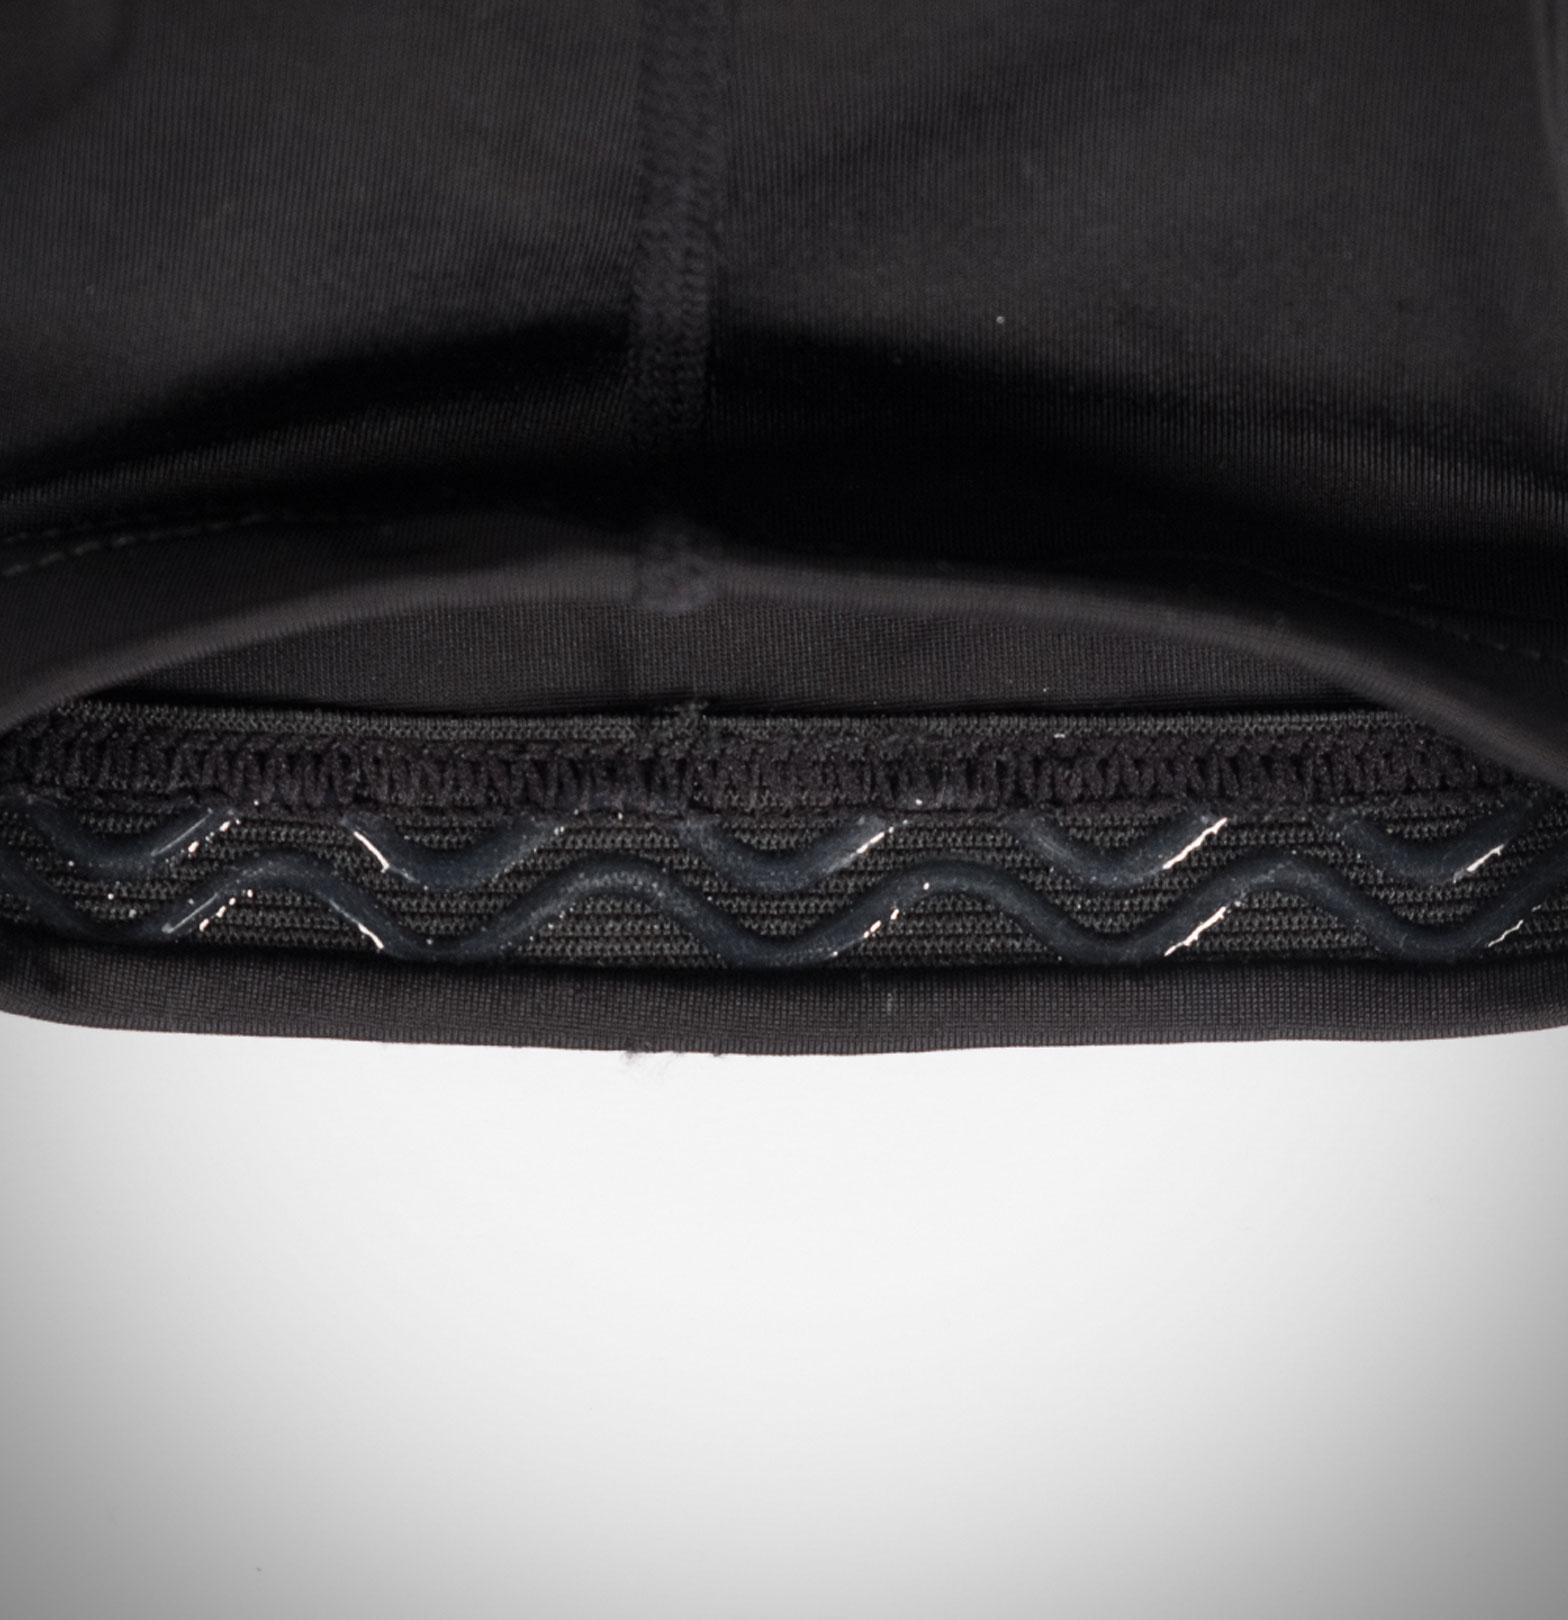 TSG Dermis Pro A Knee-Sleeves Anti-Slip